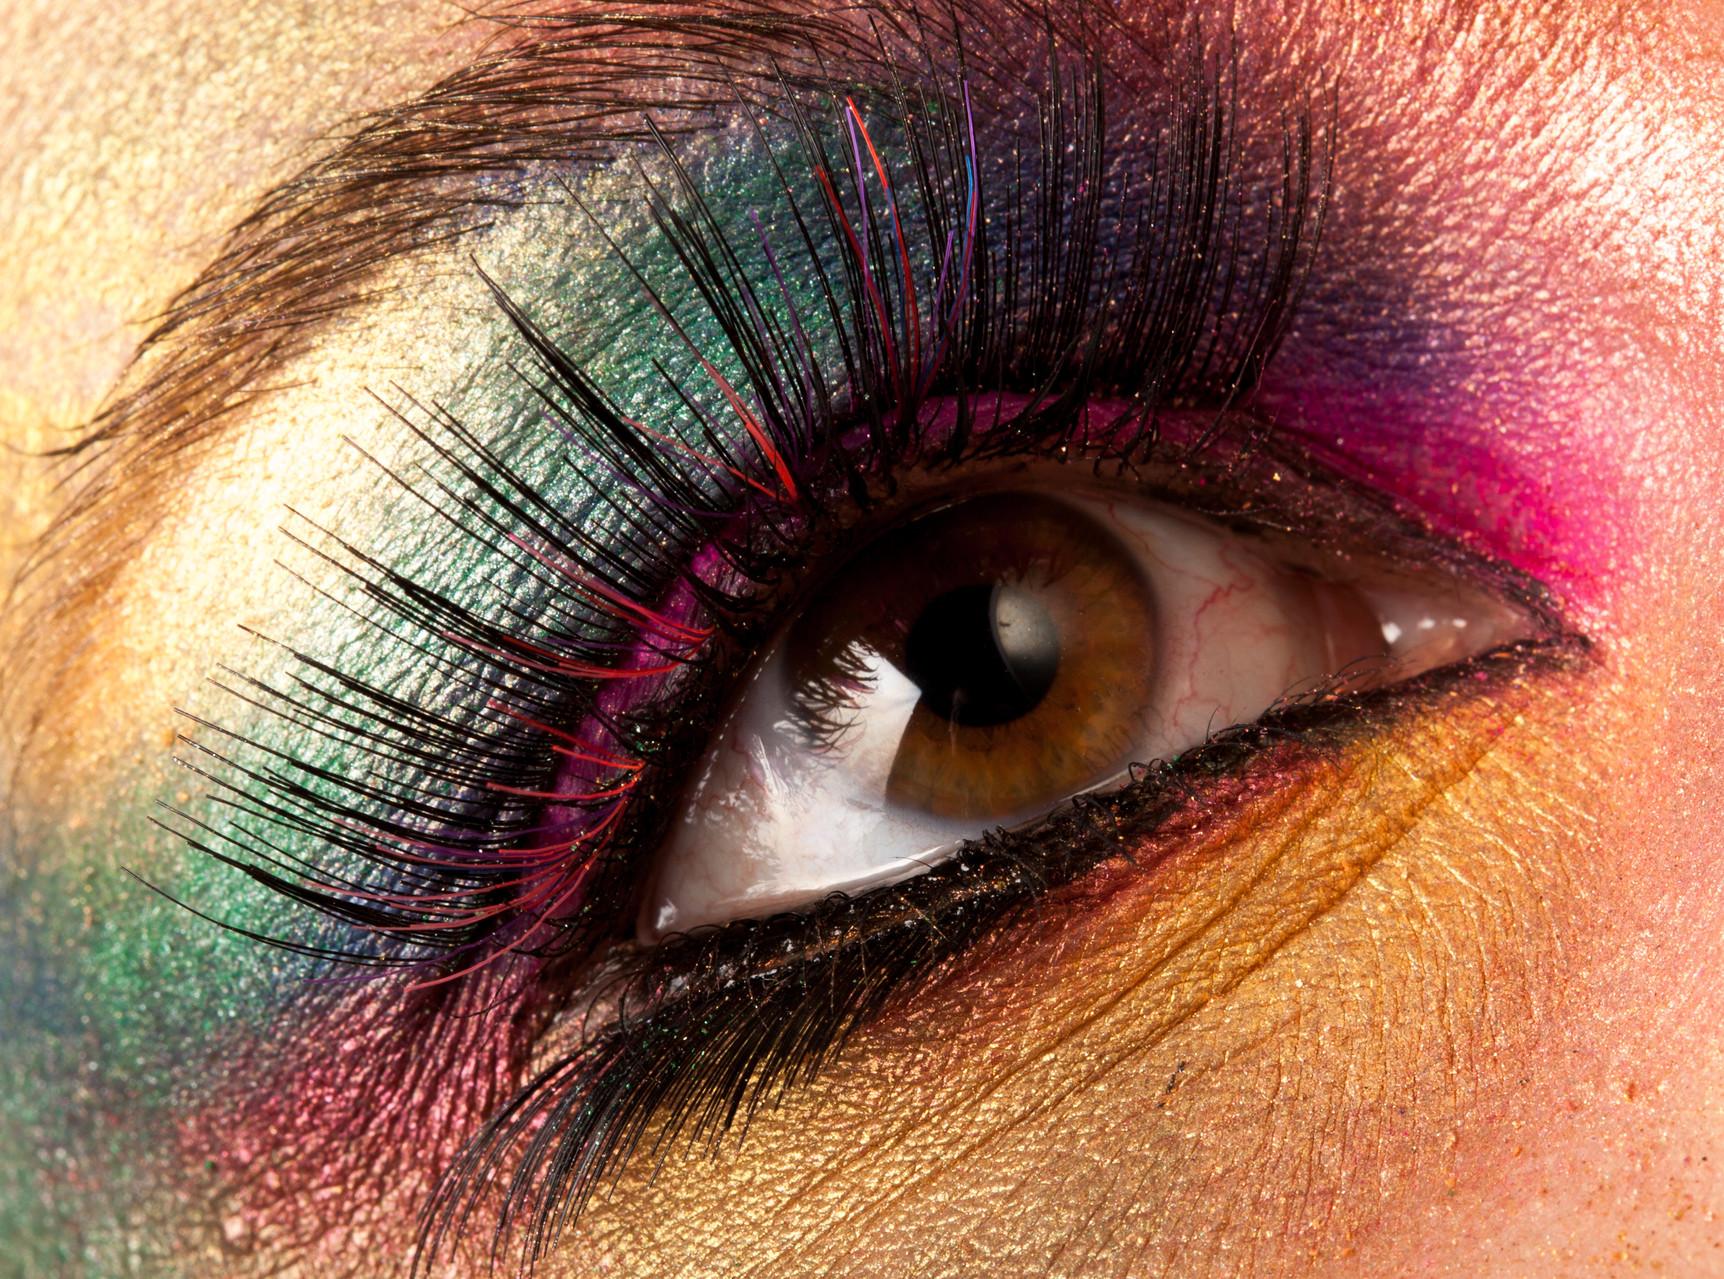 © Markus Thiel | bloos Make-up & Hair Academy | www.bloos-academy.de | Markus Thiel